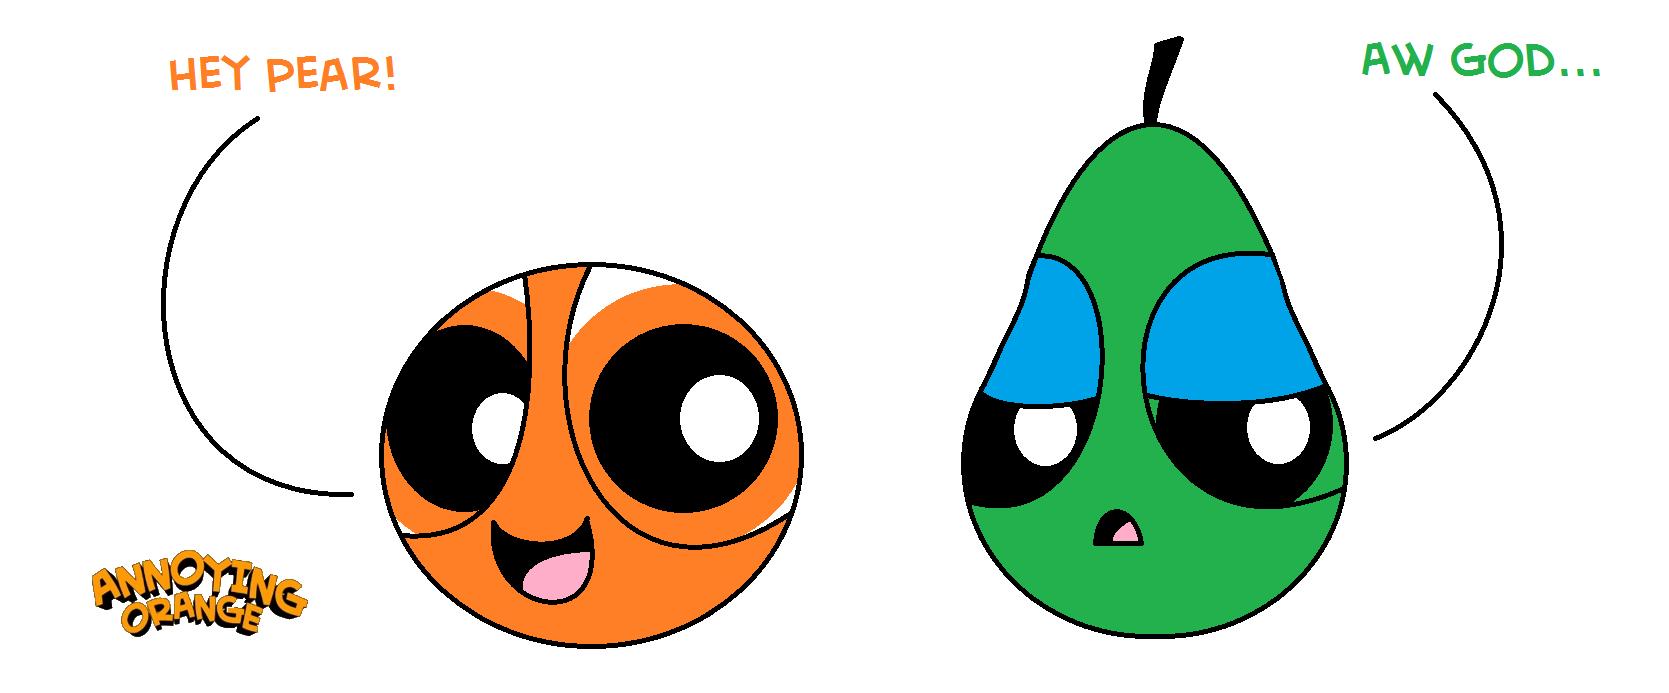 Annoying arancia, arancio and pera, corpo a pera - Powerpuff Girls style